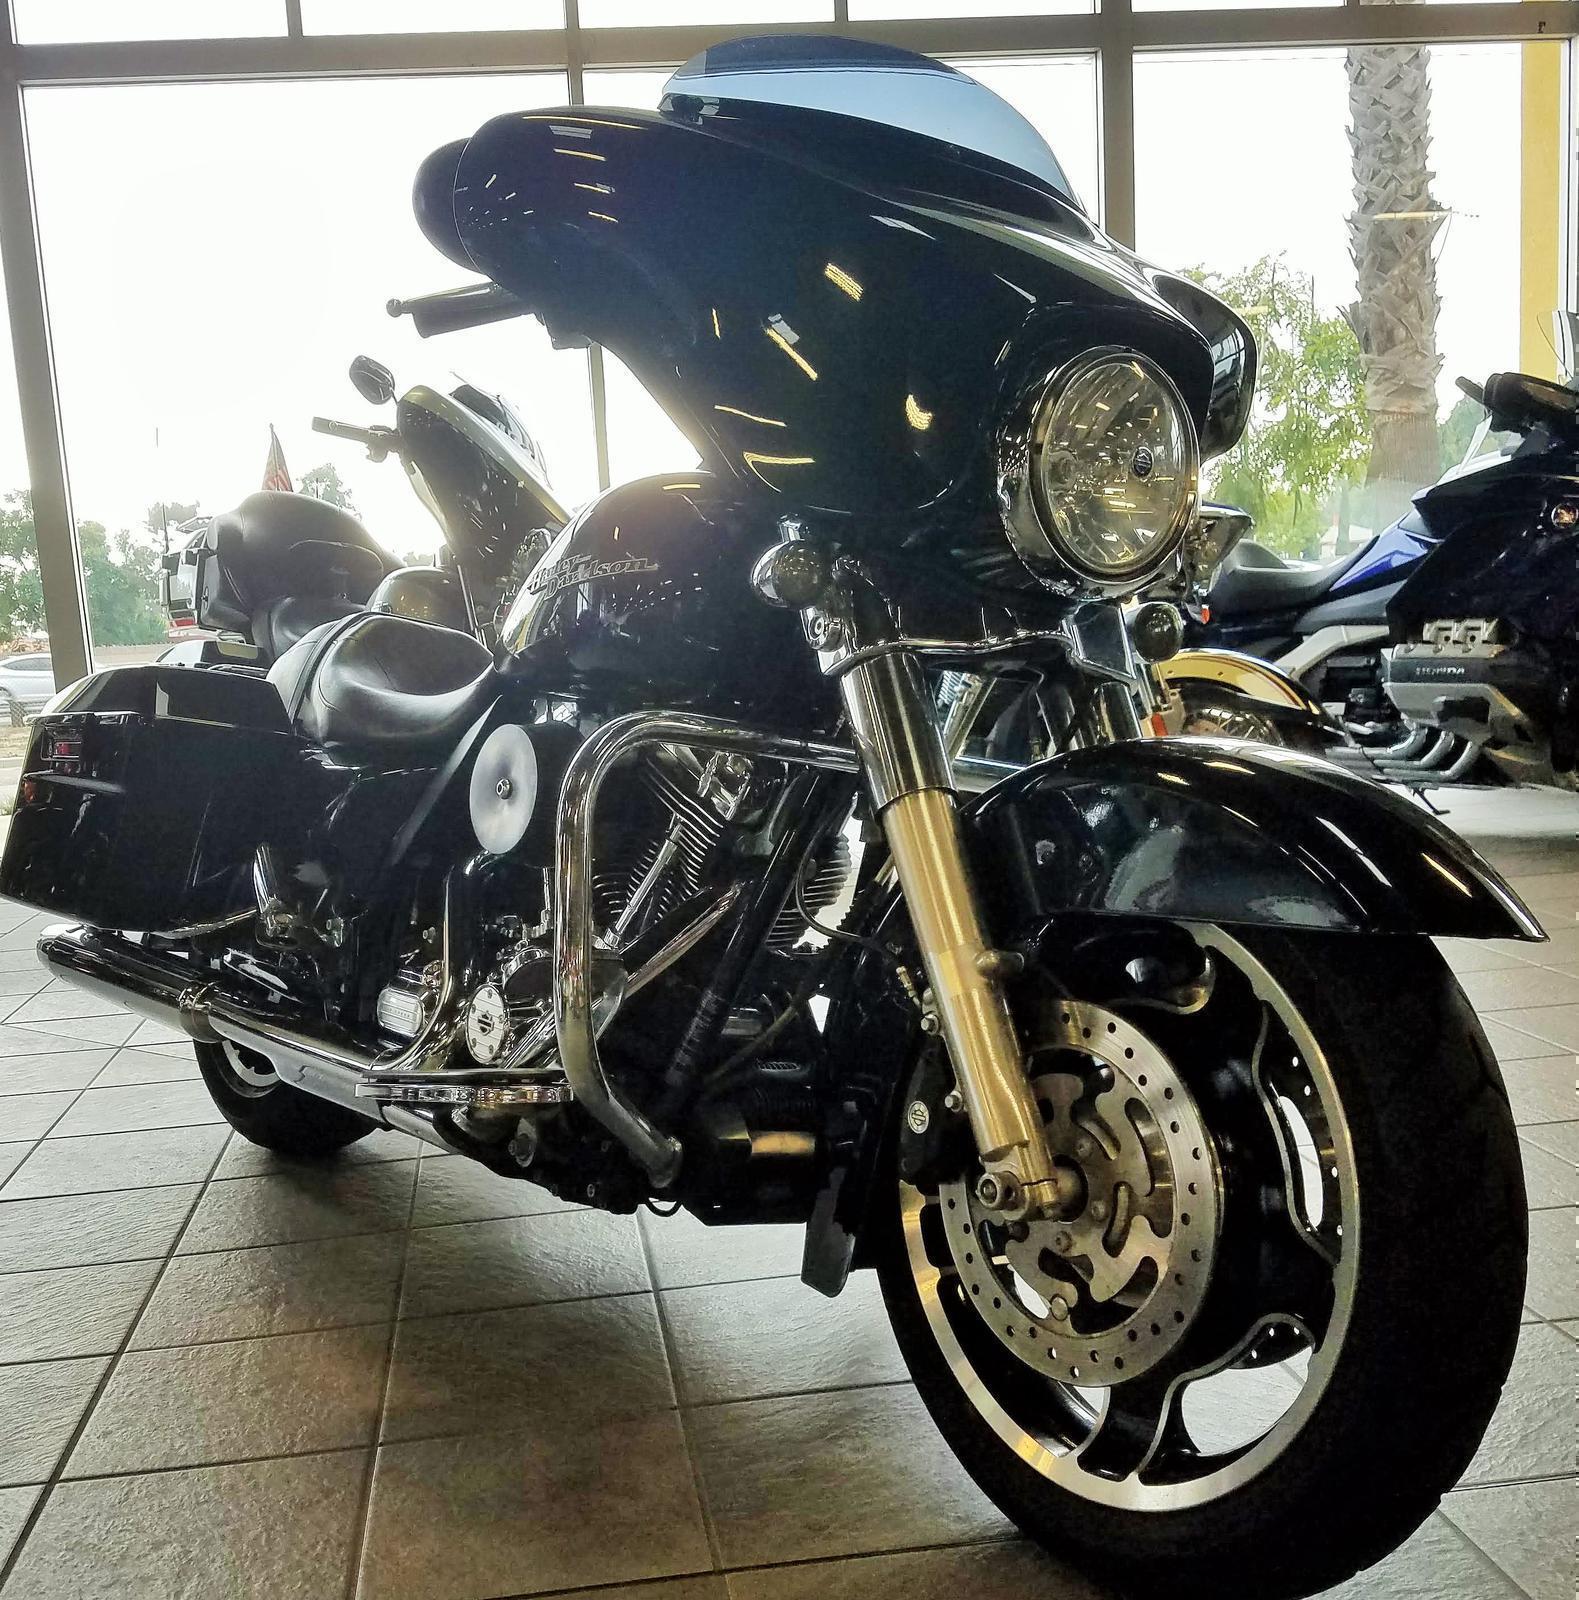 2013 Harley-Davidson® FLHX103 - STREET GLIDE